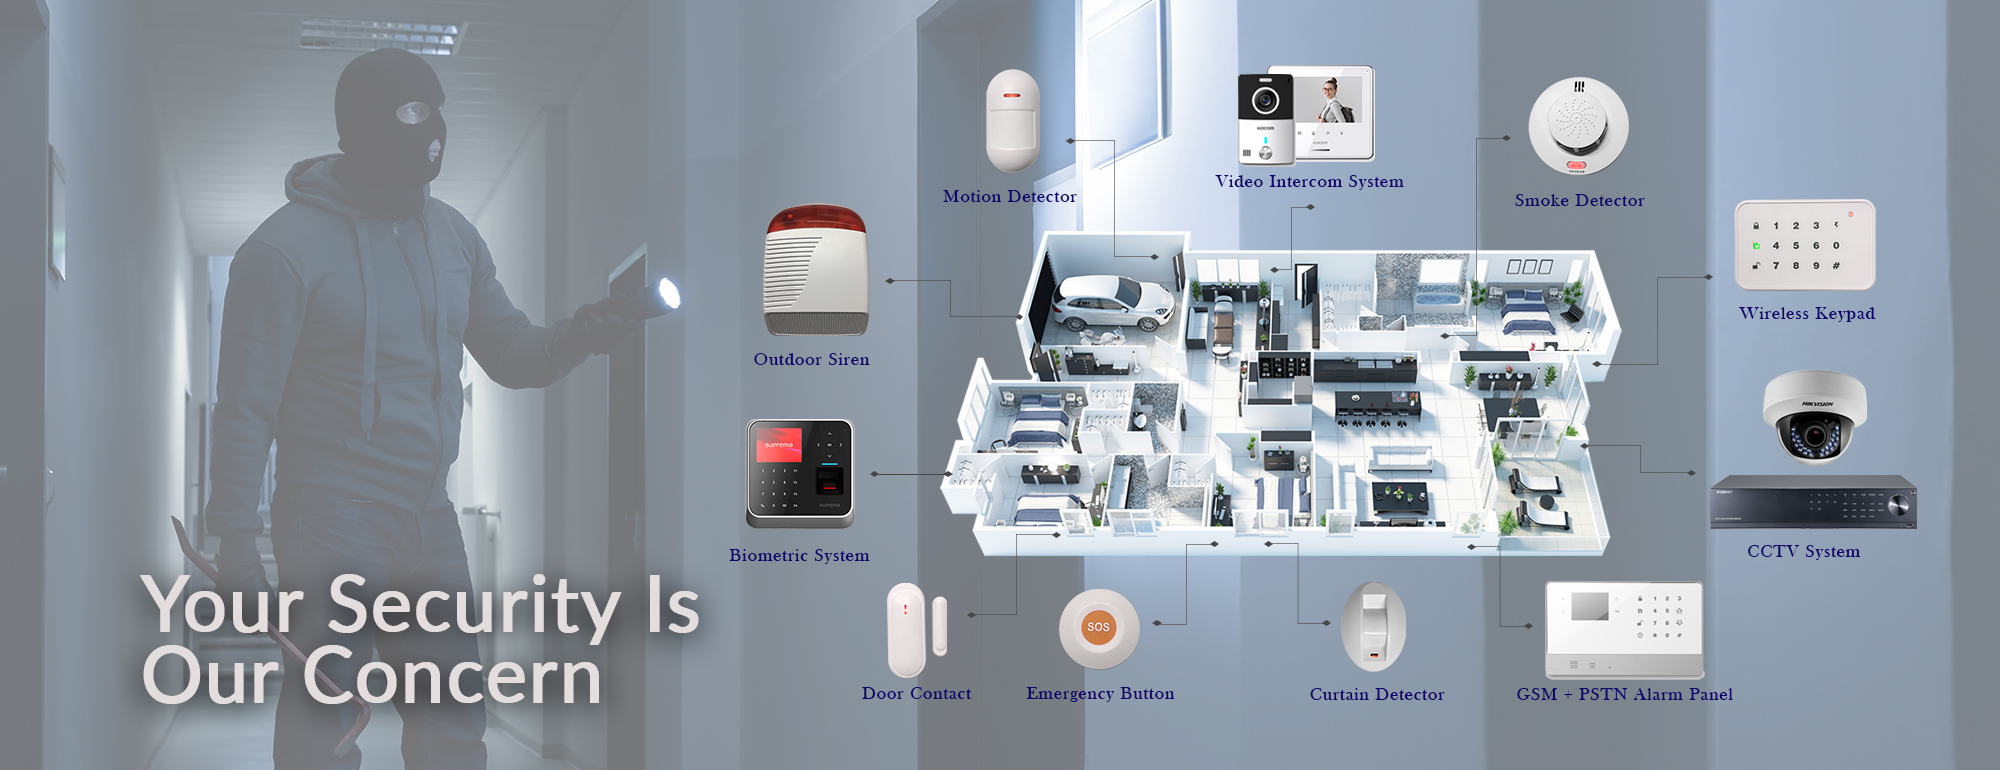 Safety Measures And Installation Through Cctv Surveillance.